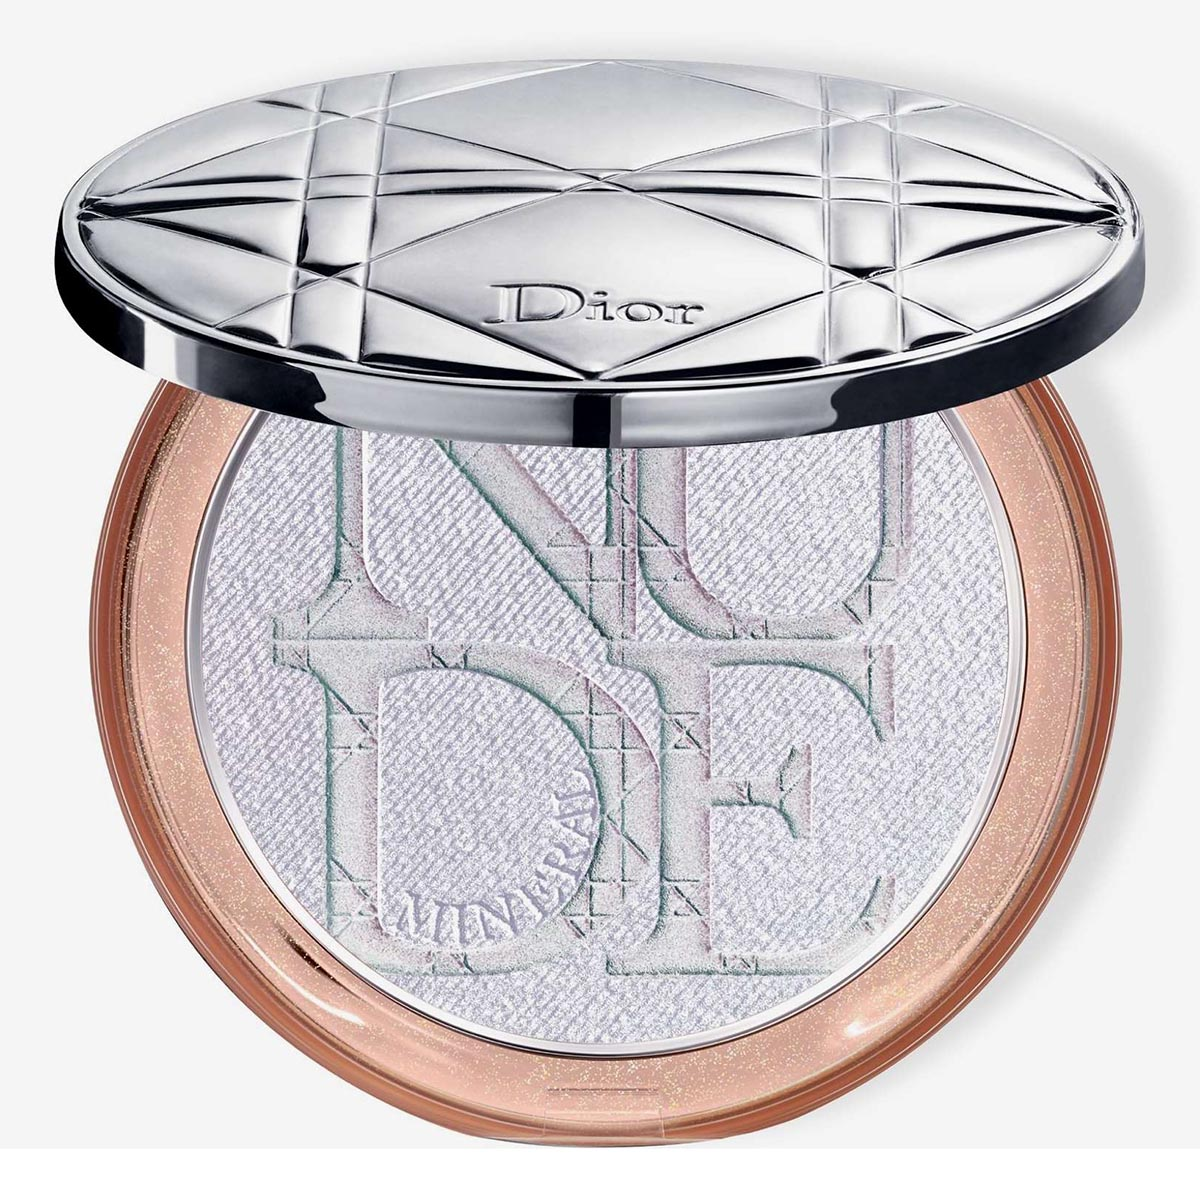 Dior diorskin mineral luminious powder 06 holographic glow